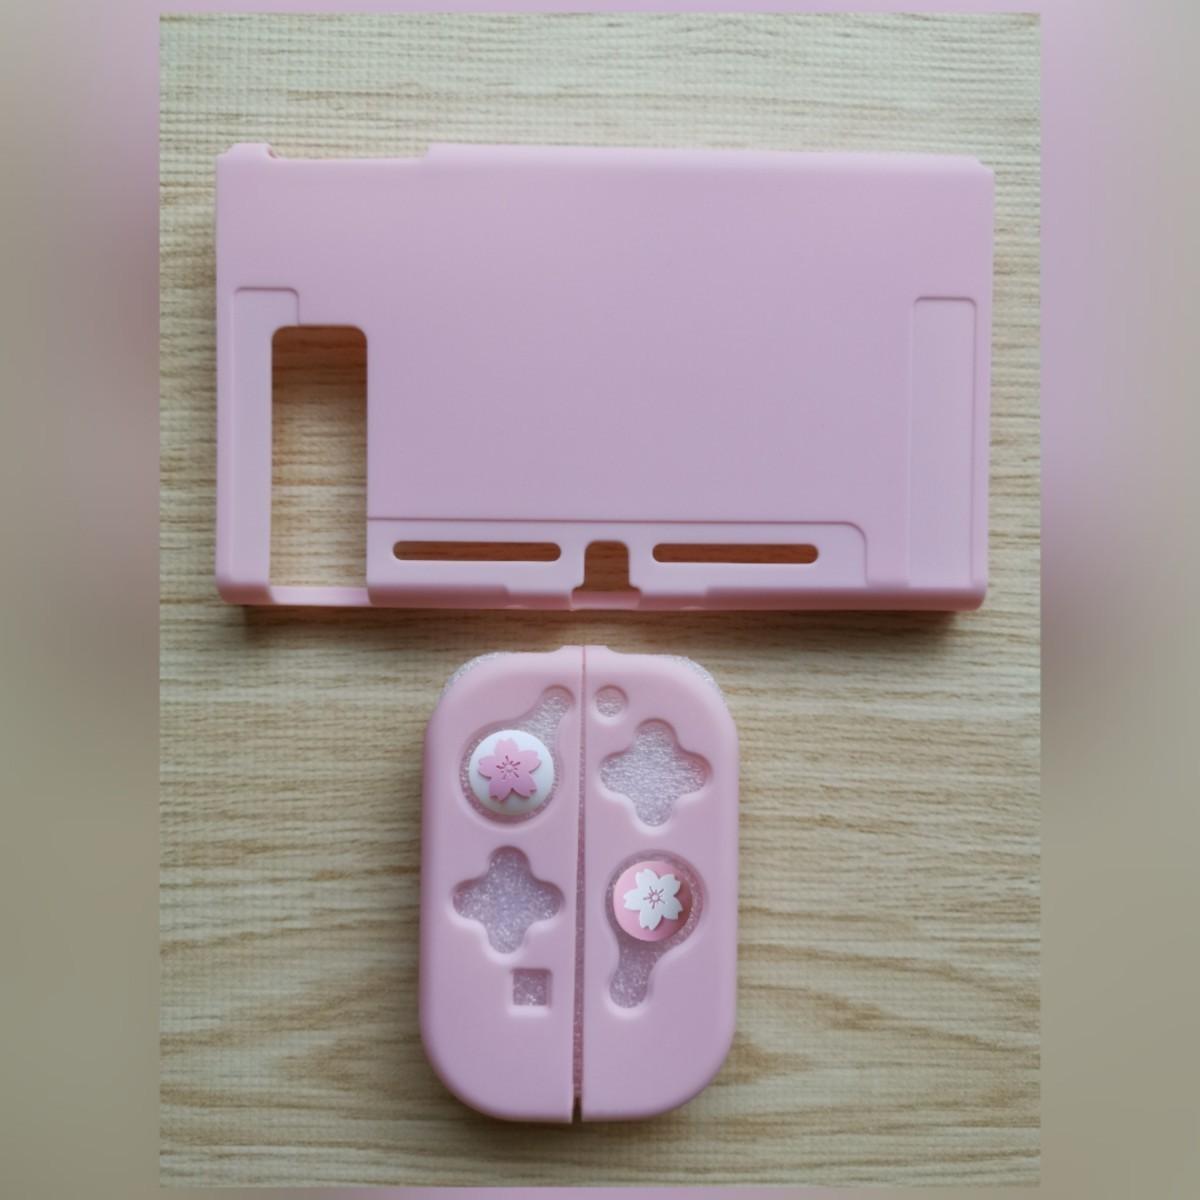 Nintendo switch 任天堂スイッチ スイッチカバー ピンク